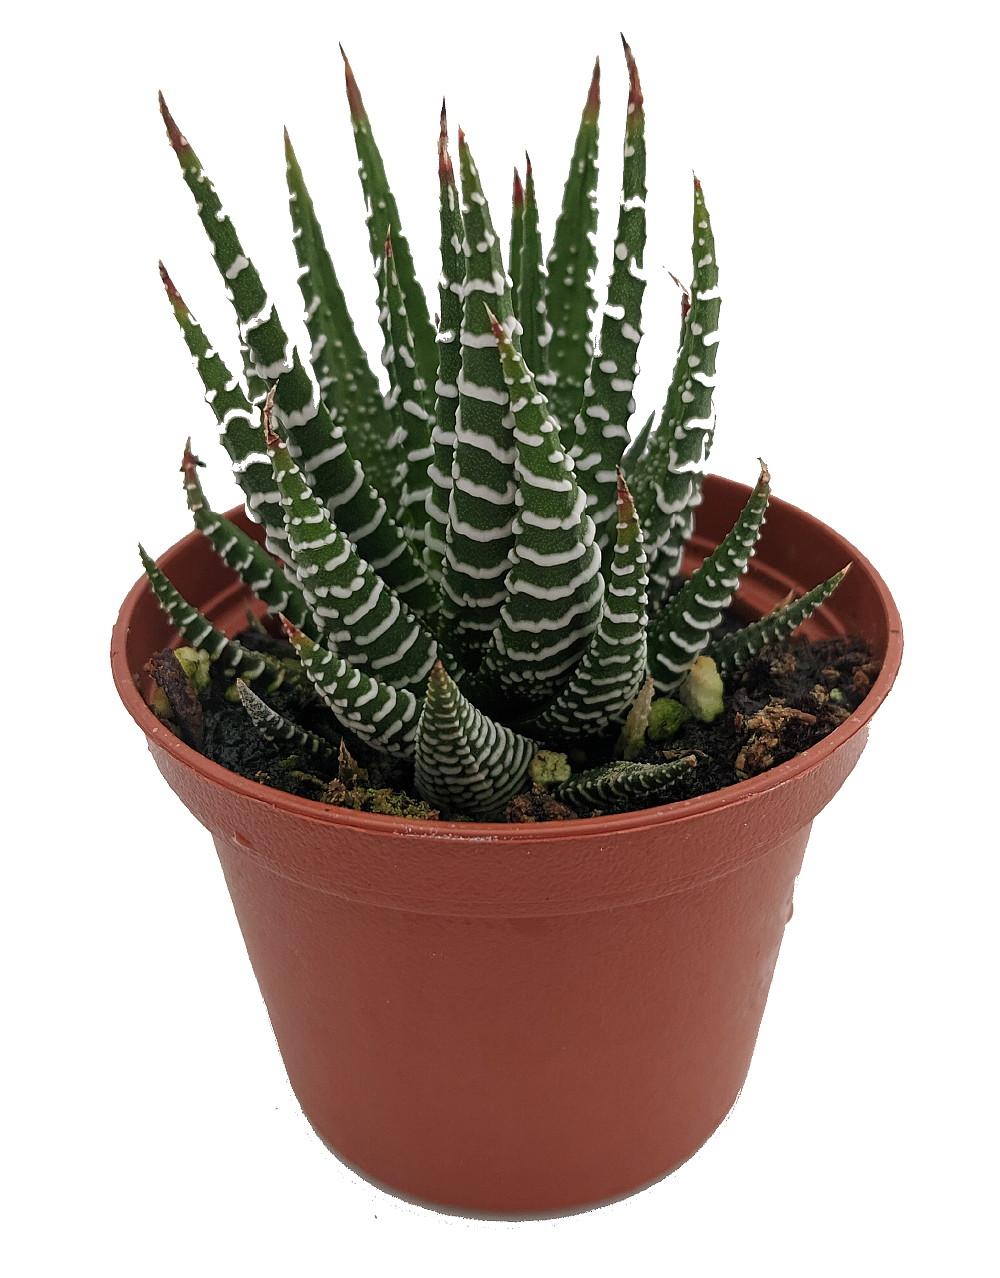 Succulent /'Zebra/' 1-Pack  2.5 Pot  Live Home and Garden Plants